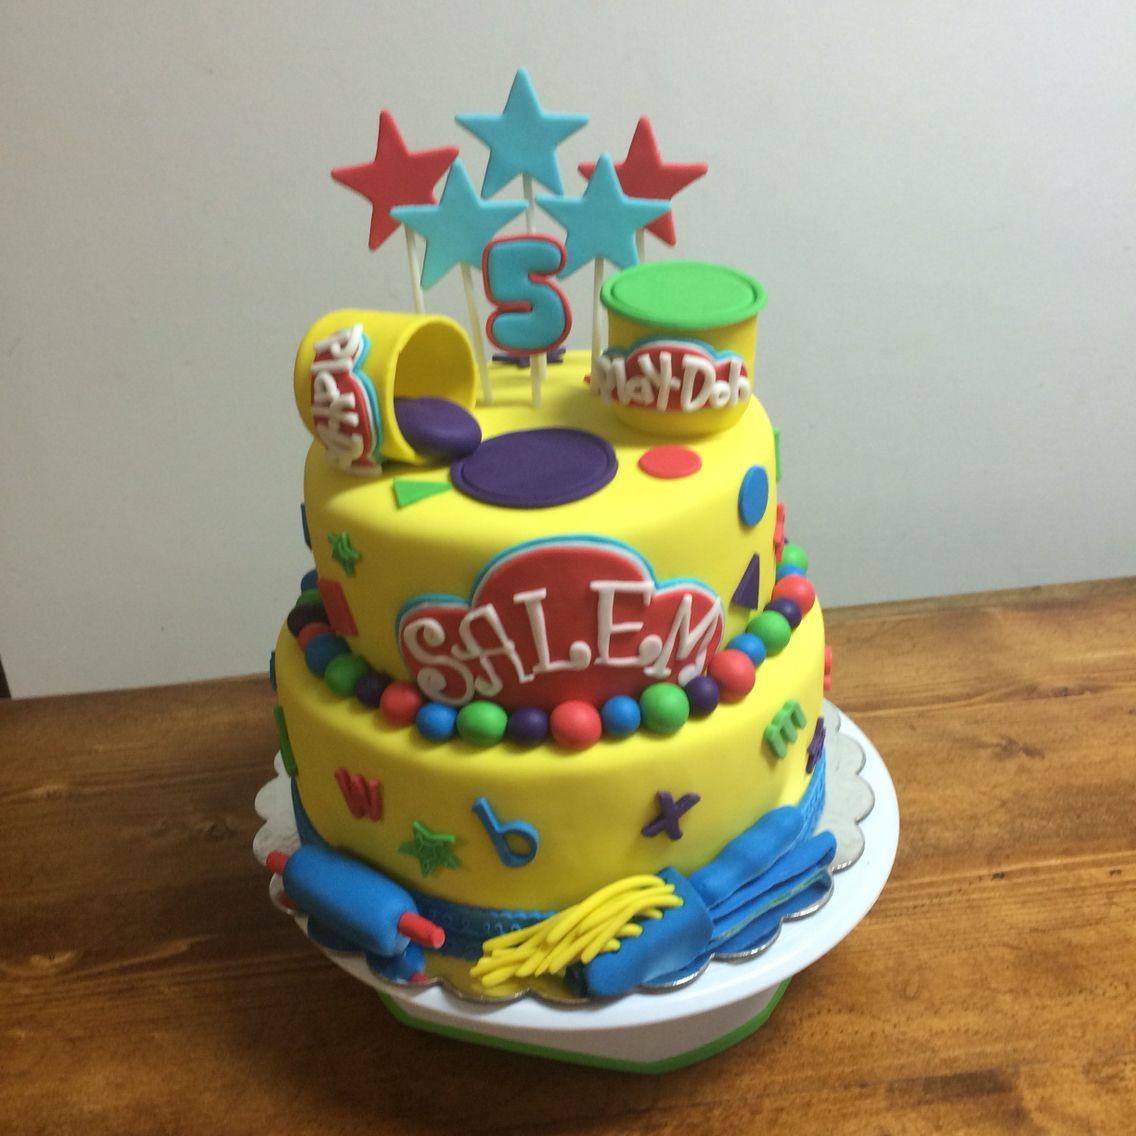 Play Doh Birthday Cake  Play Doh cake My Cake Creations Pinterest